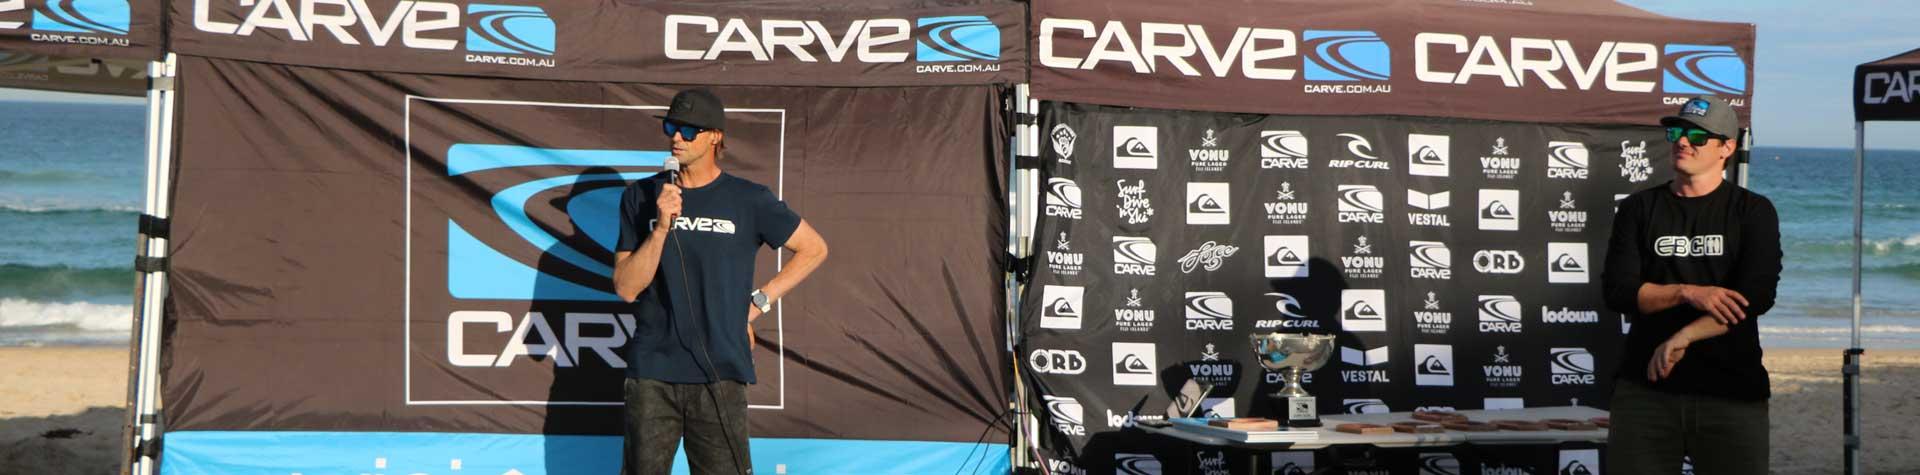 EBC-elouera-board-riders-club_sponsors